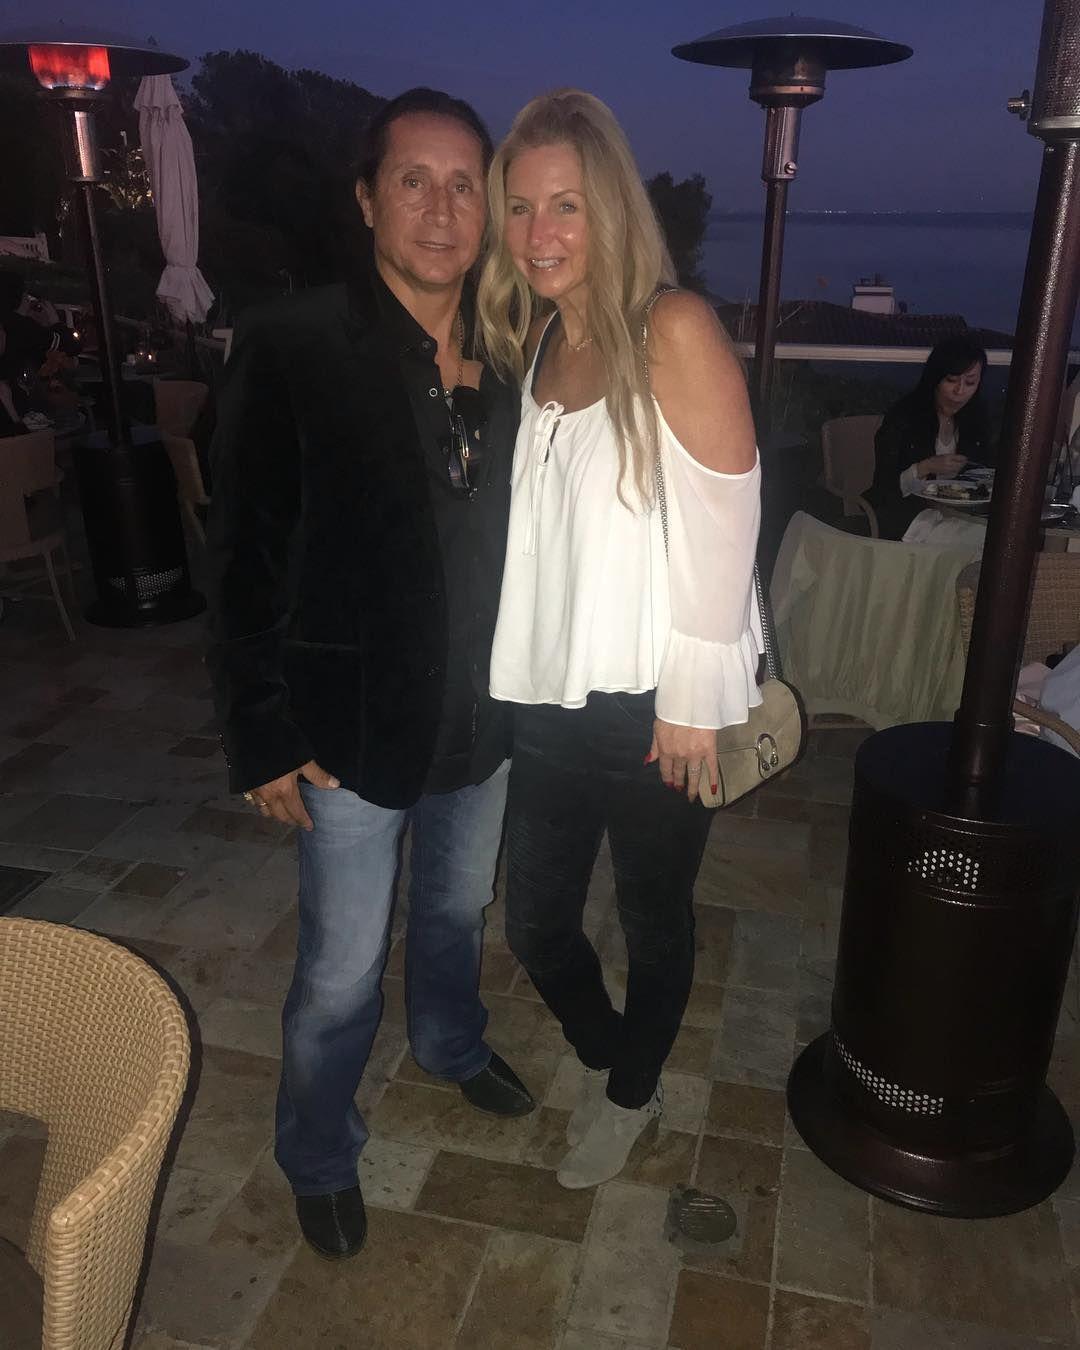 REALTORS LICENSED HANDYMAN .. 310-927-4492 .. PLUMBER ELECTRICIAN PAINTER ARTIST HANDYMAN #Plumber #Electrician #Painter #BeverlyHills #PorterRanch #ShermanOaks #WoodlandHills #HollywoodHills #Malibu #Realtor #Artist #Tarzana #Brentwood #BelAir #Hollywood #StudioCity #PacificPalisades #Encino #Plumbing #LosAngeles #Westwood #Calabasas #SantaMonica #Burbank #Handyman #Luxury #GranadaHills #WestHollywood #Electrical #Chatsworth